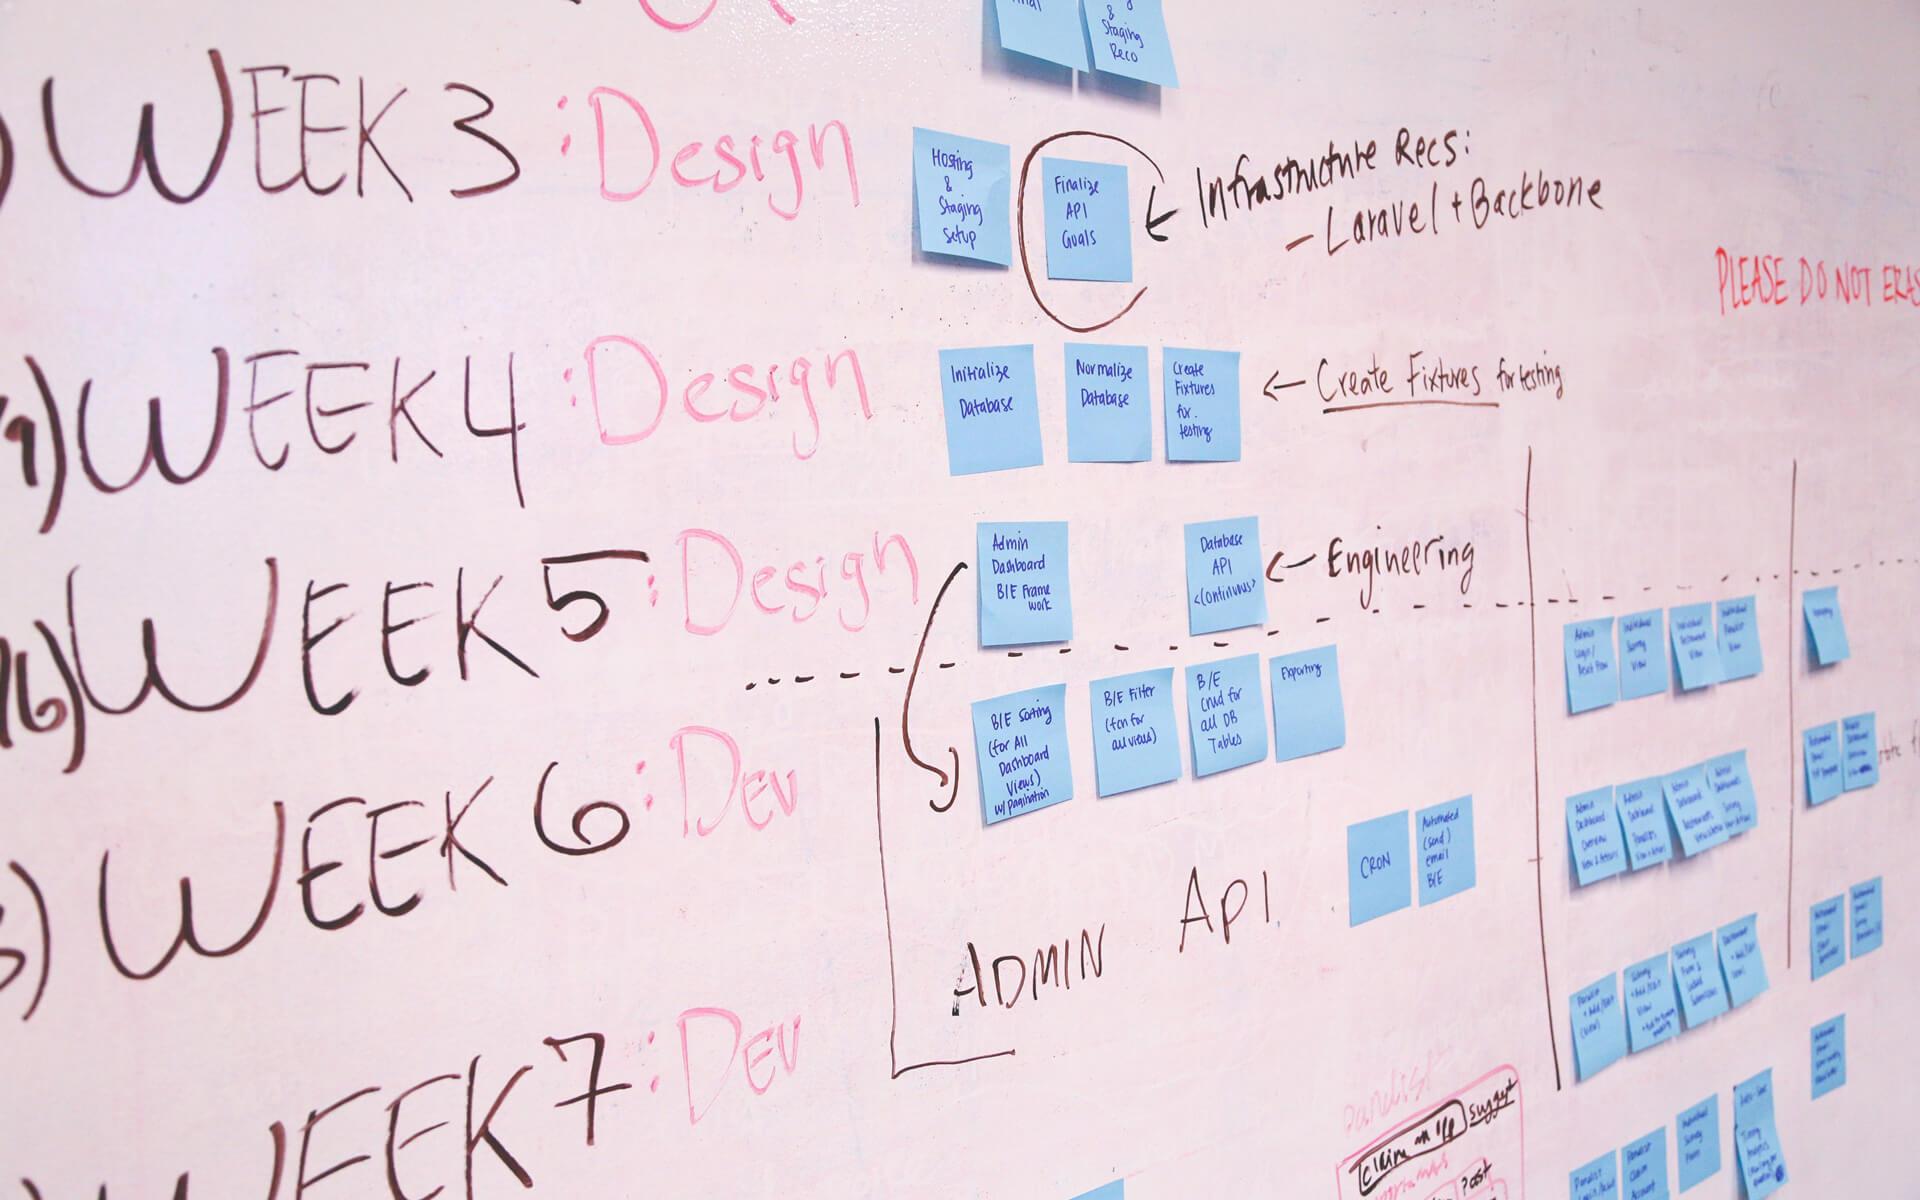 4 tips to make time estimating easier